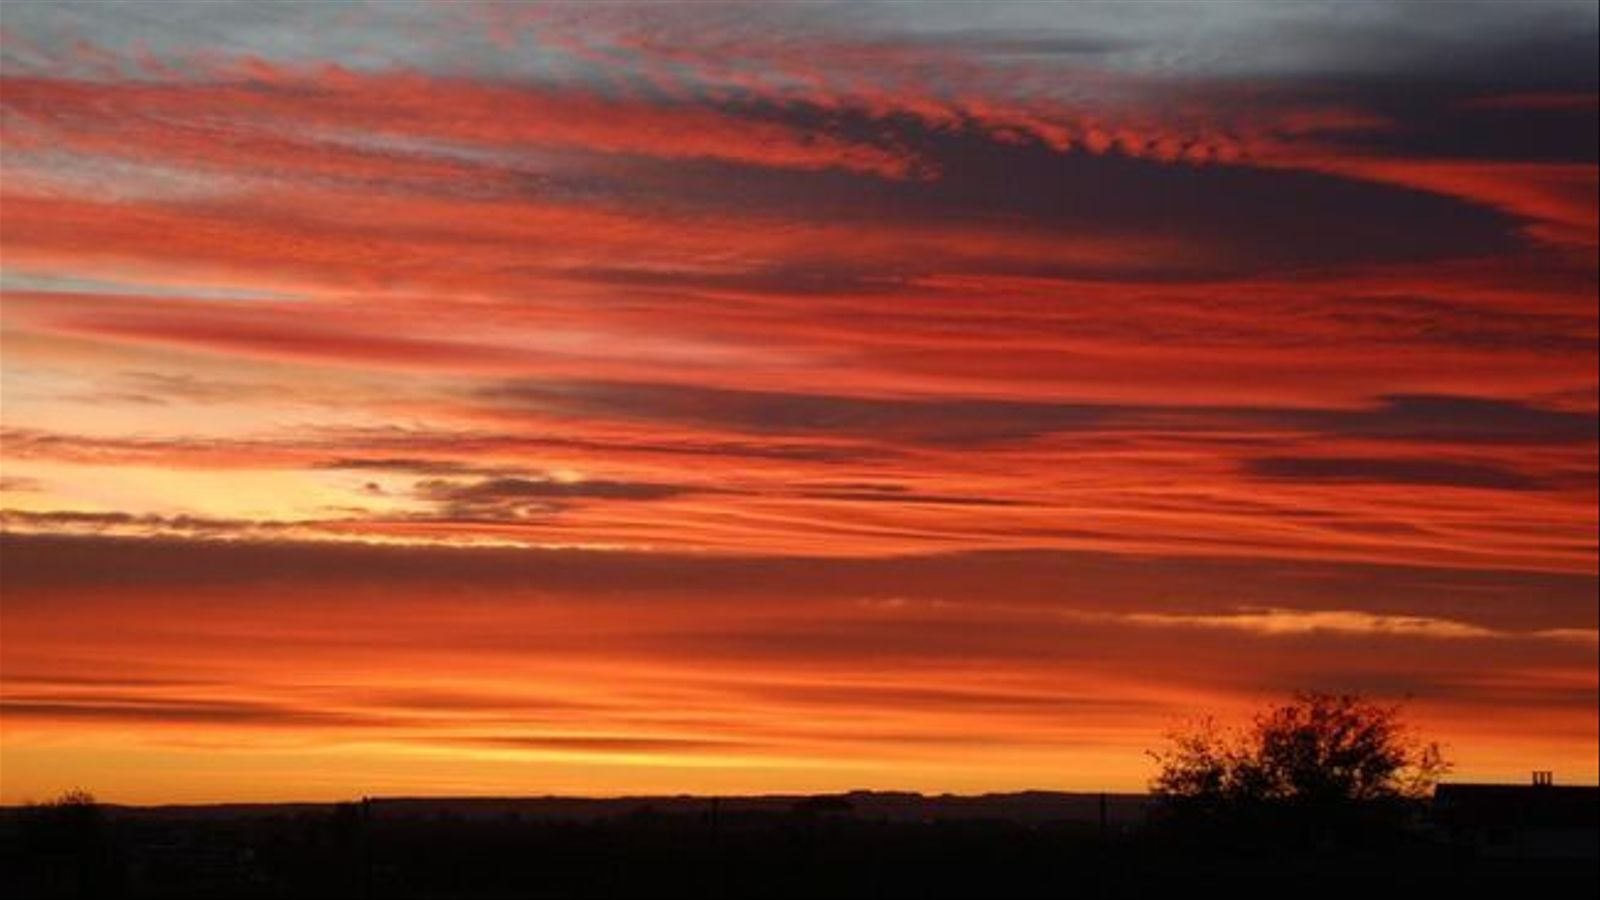 Els núvols prims han afavorit una albada preciosa avui a Ivars d'Urgell / XAVIER COLL